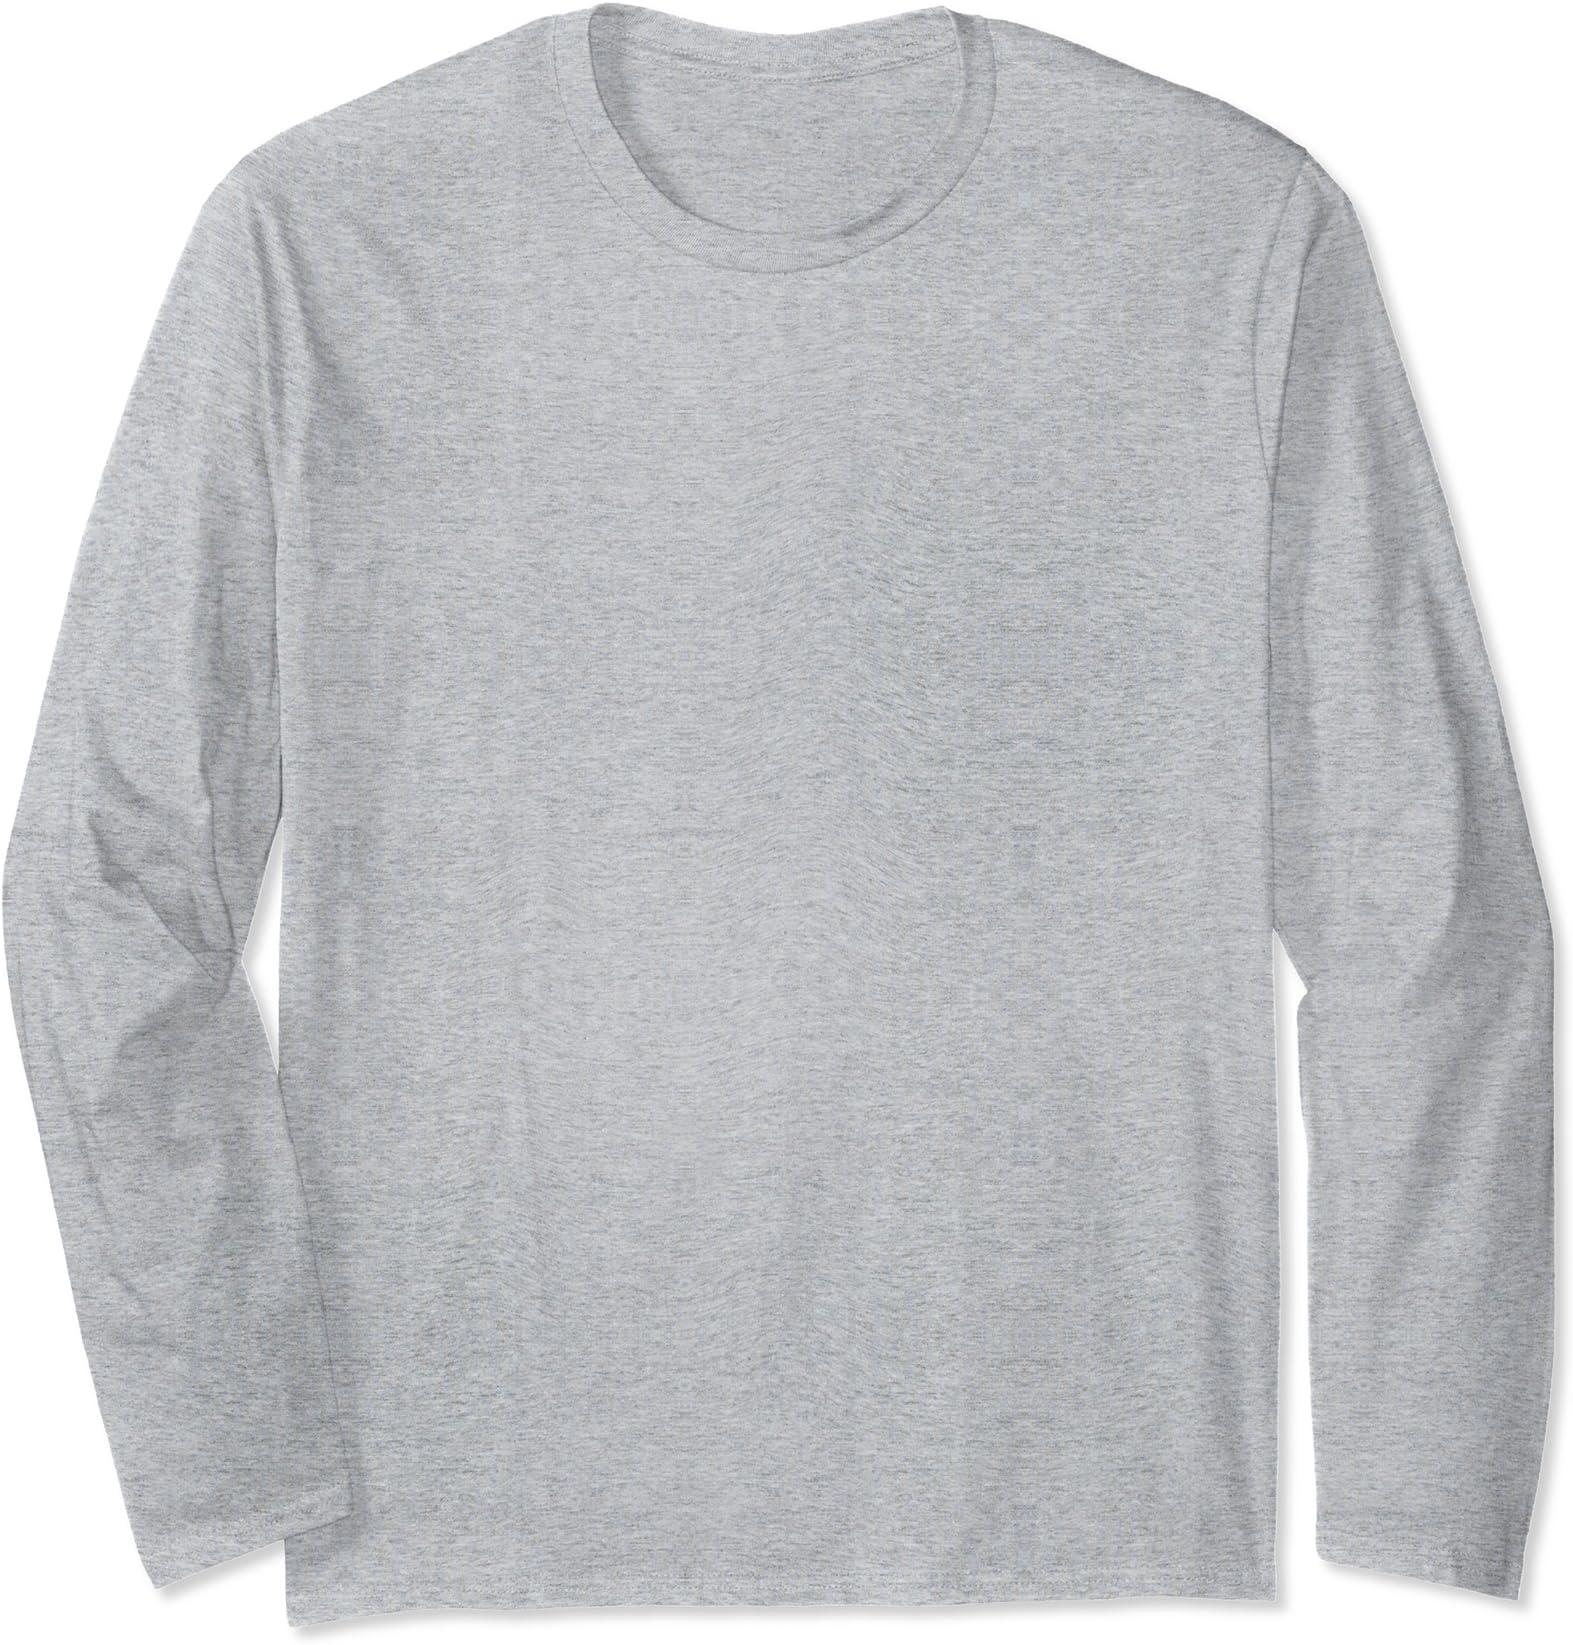 United States Flag Unity Political Patriotic Men/'s Long Sleeve Shirt